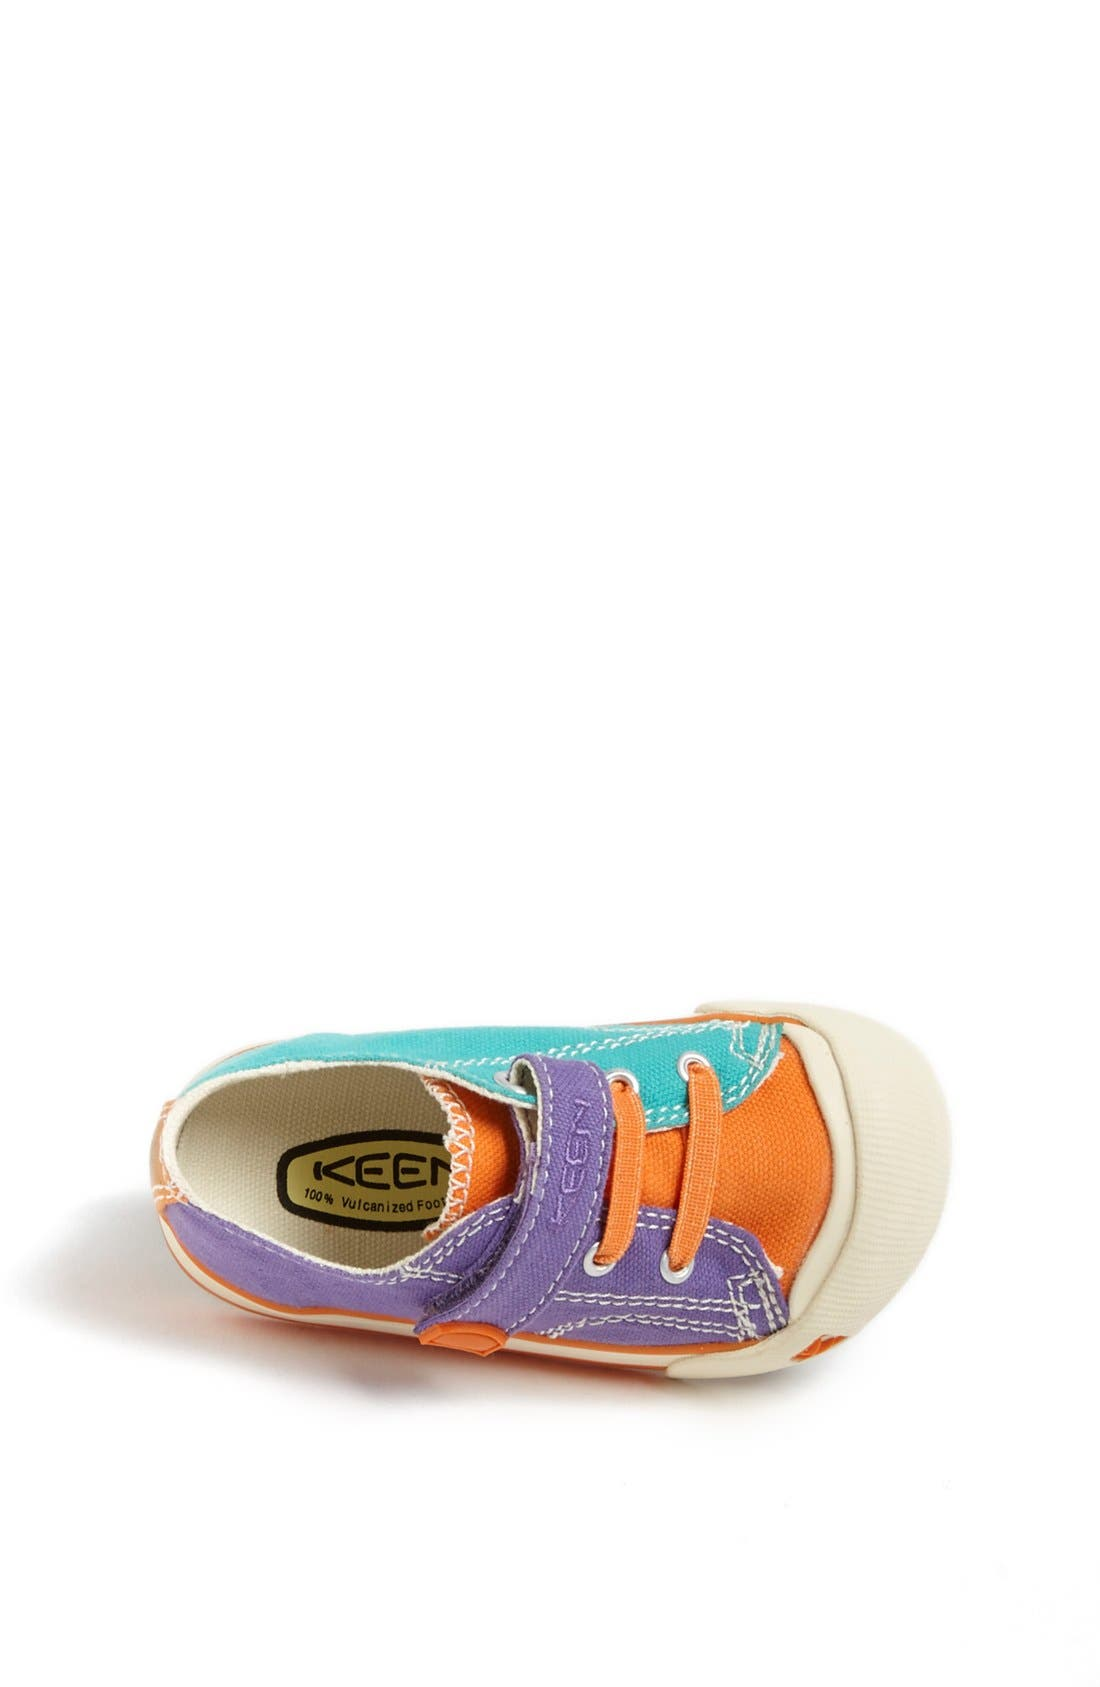 Alternate Image 3  - Keen 'Coronado' Sneaker (Baby & Walker)